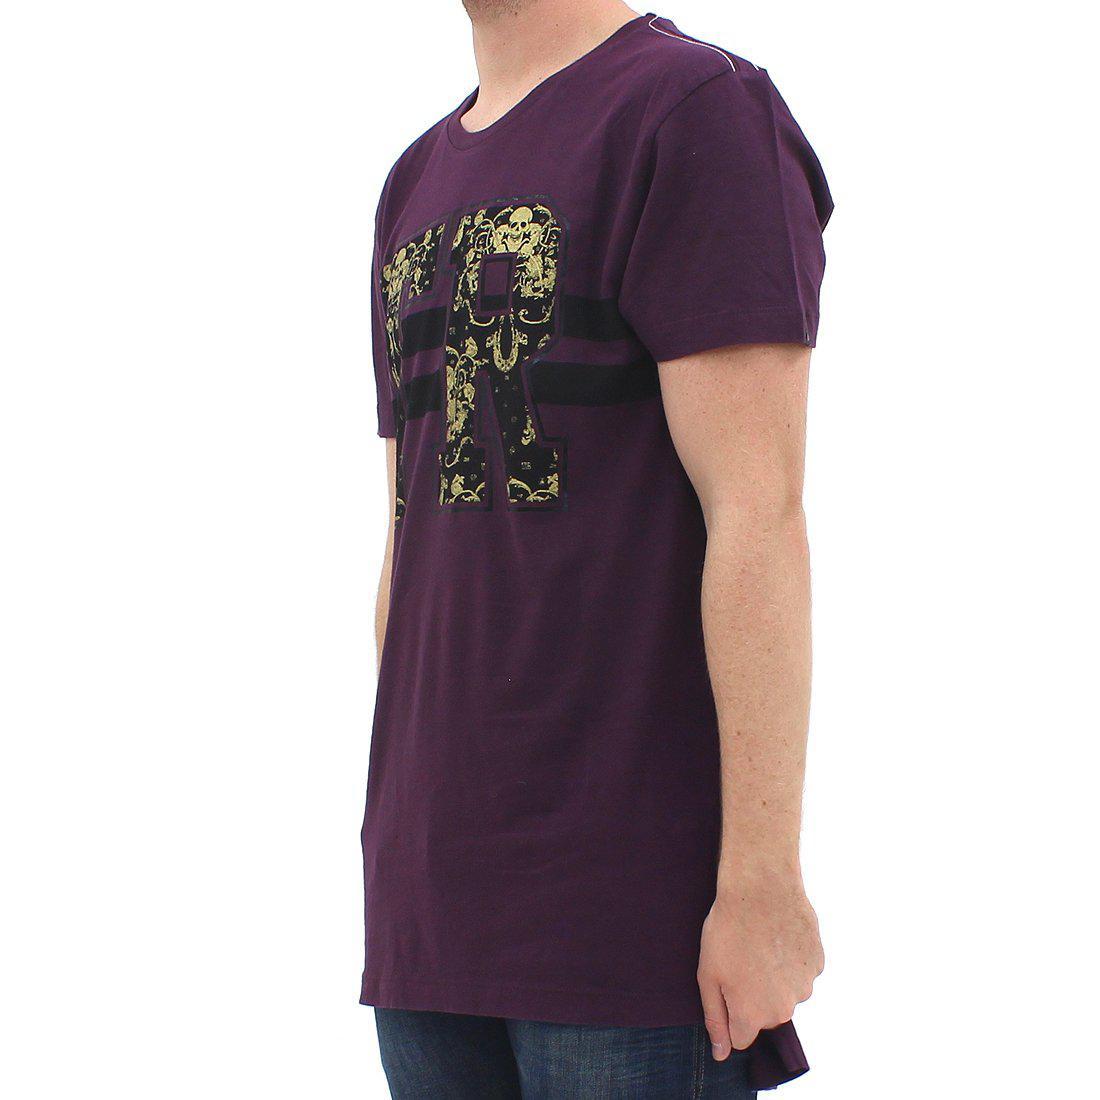 a41a3618 True Religion Tr Brocade Tee Burgundy in Purple for Men - Lyst